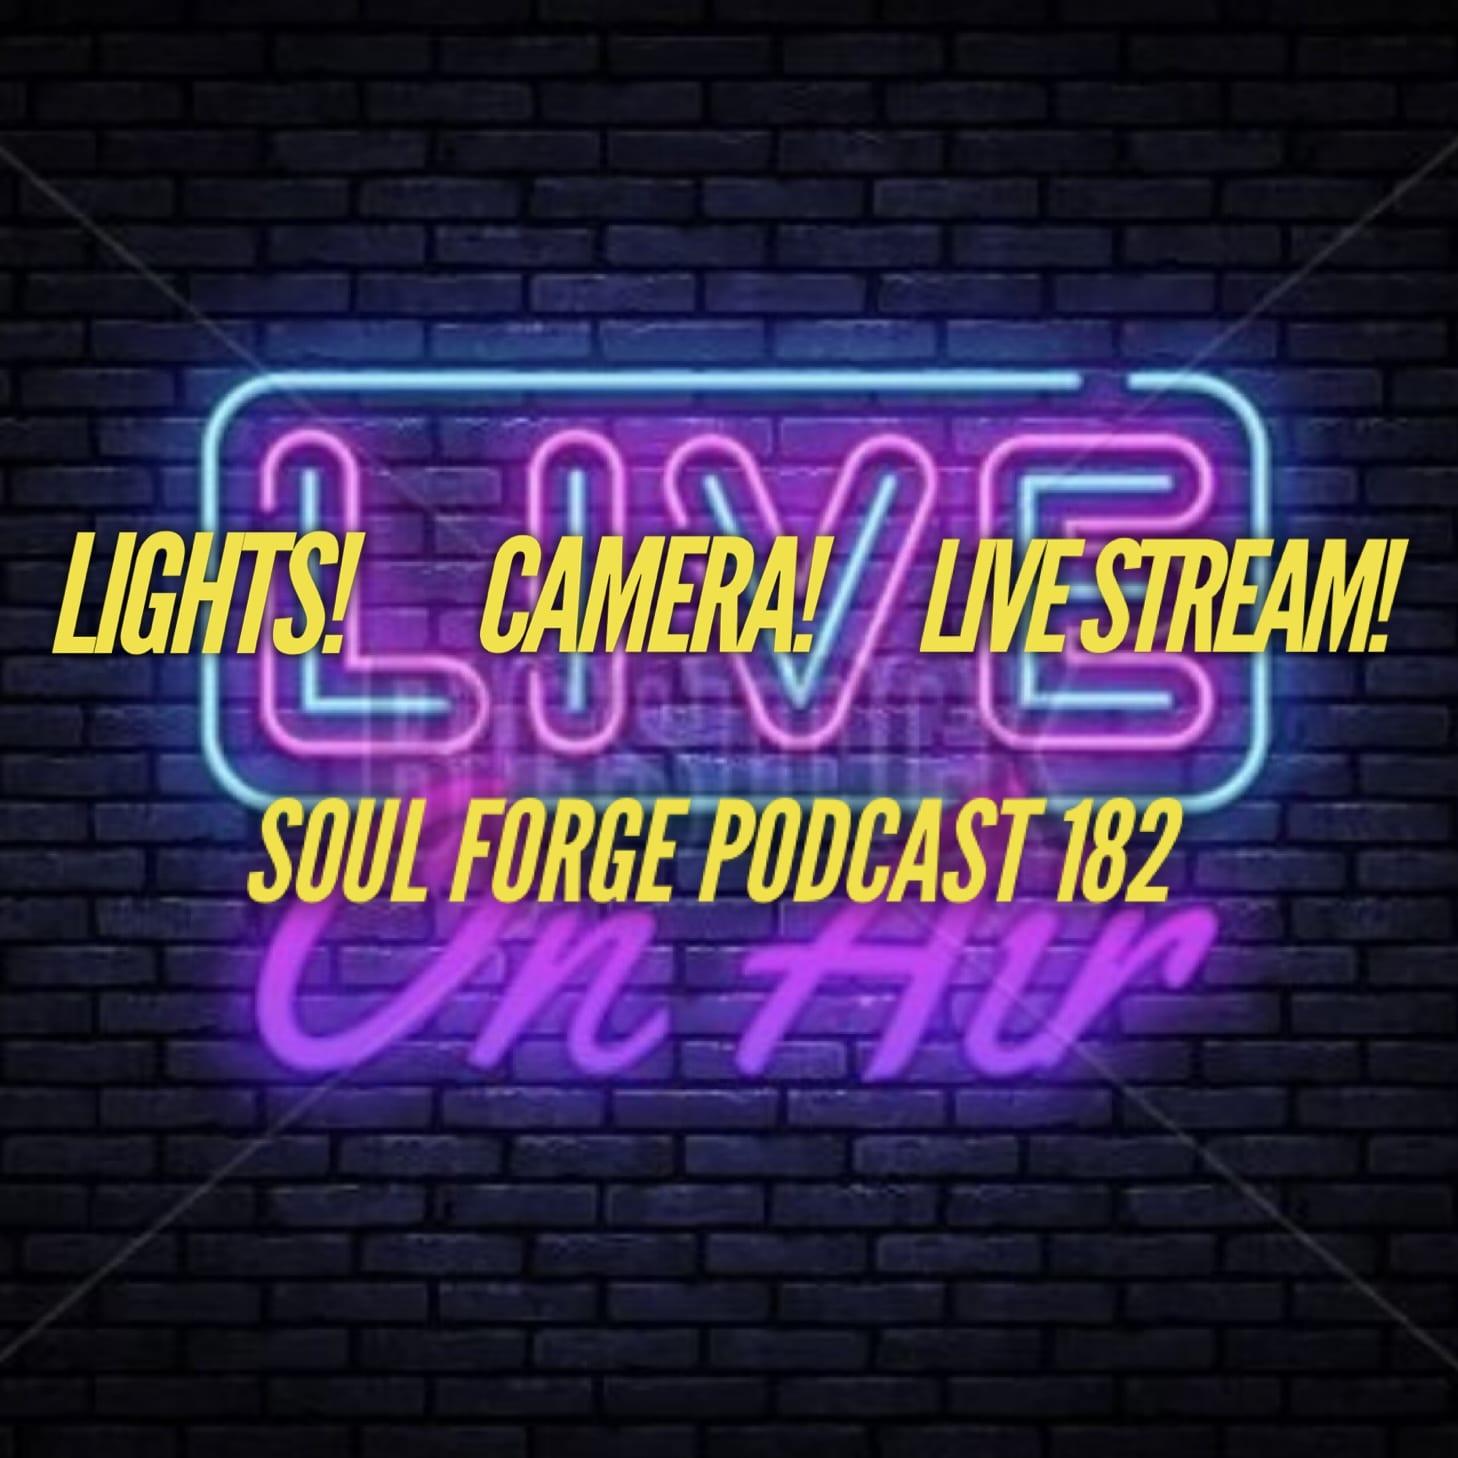 Soul Forge live stream